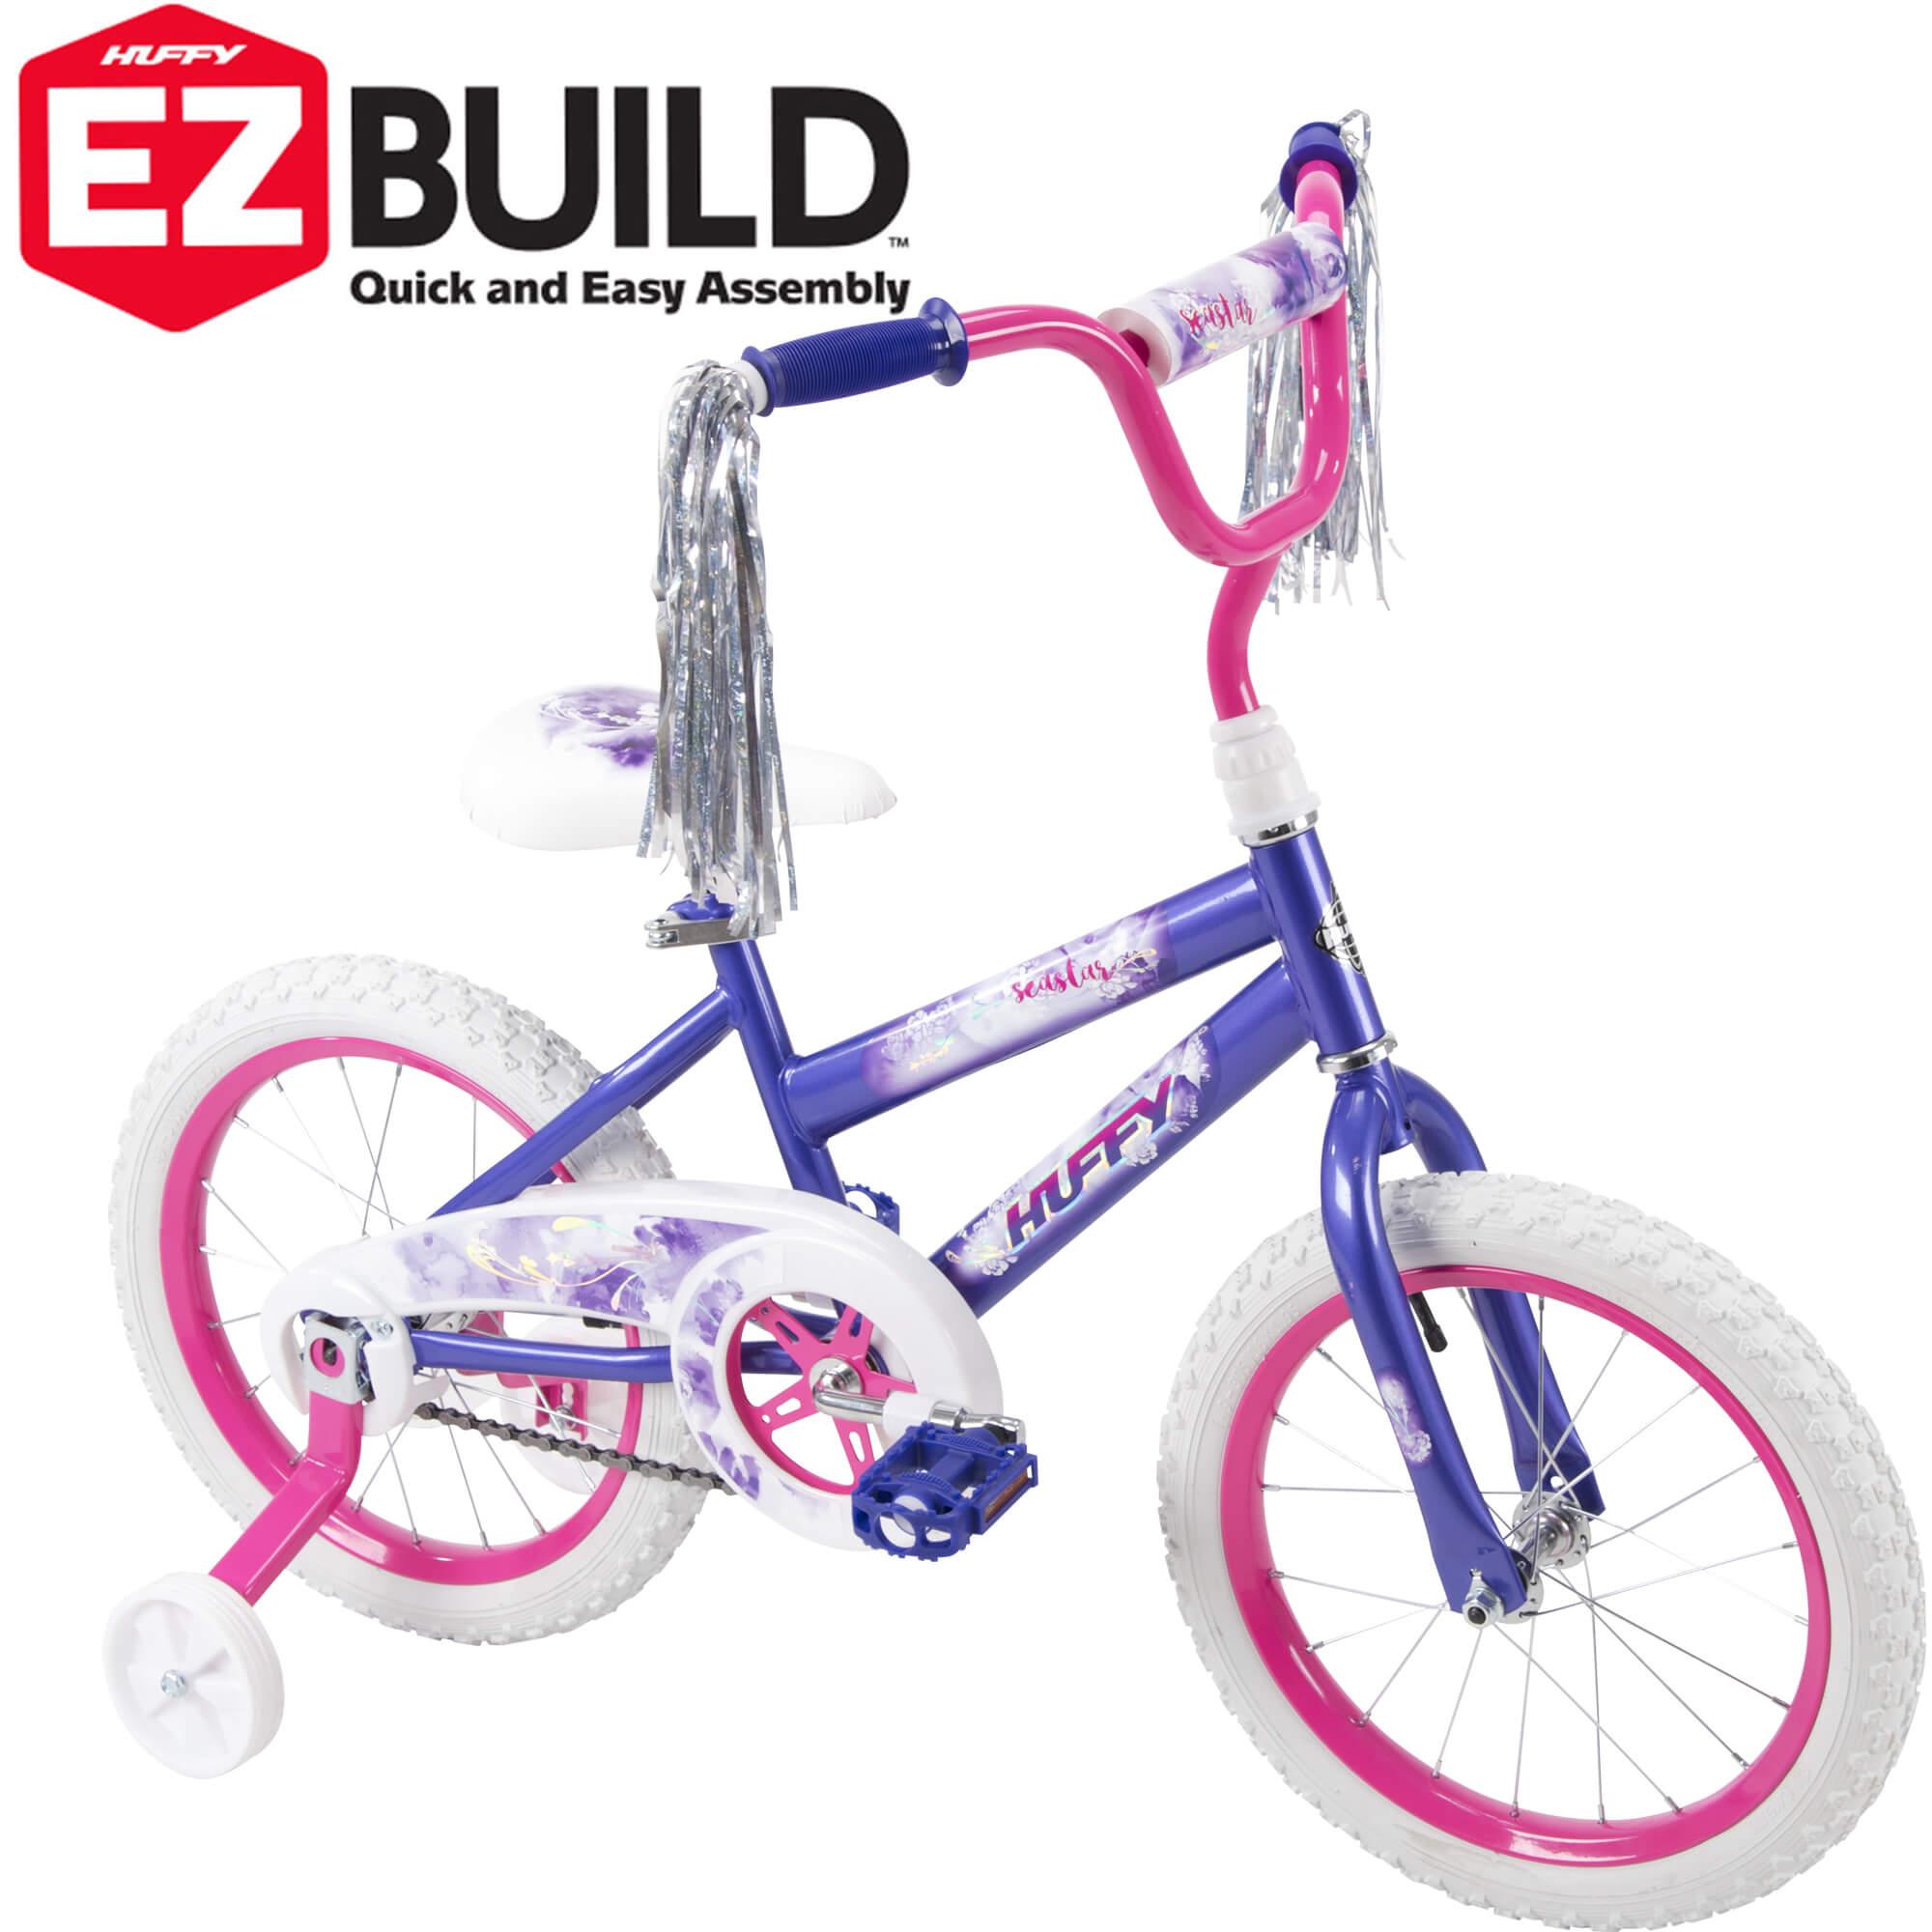 "Huffy 16"" Sea Star EZ Build Kids Bike for Girls', Purple"